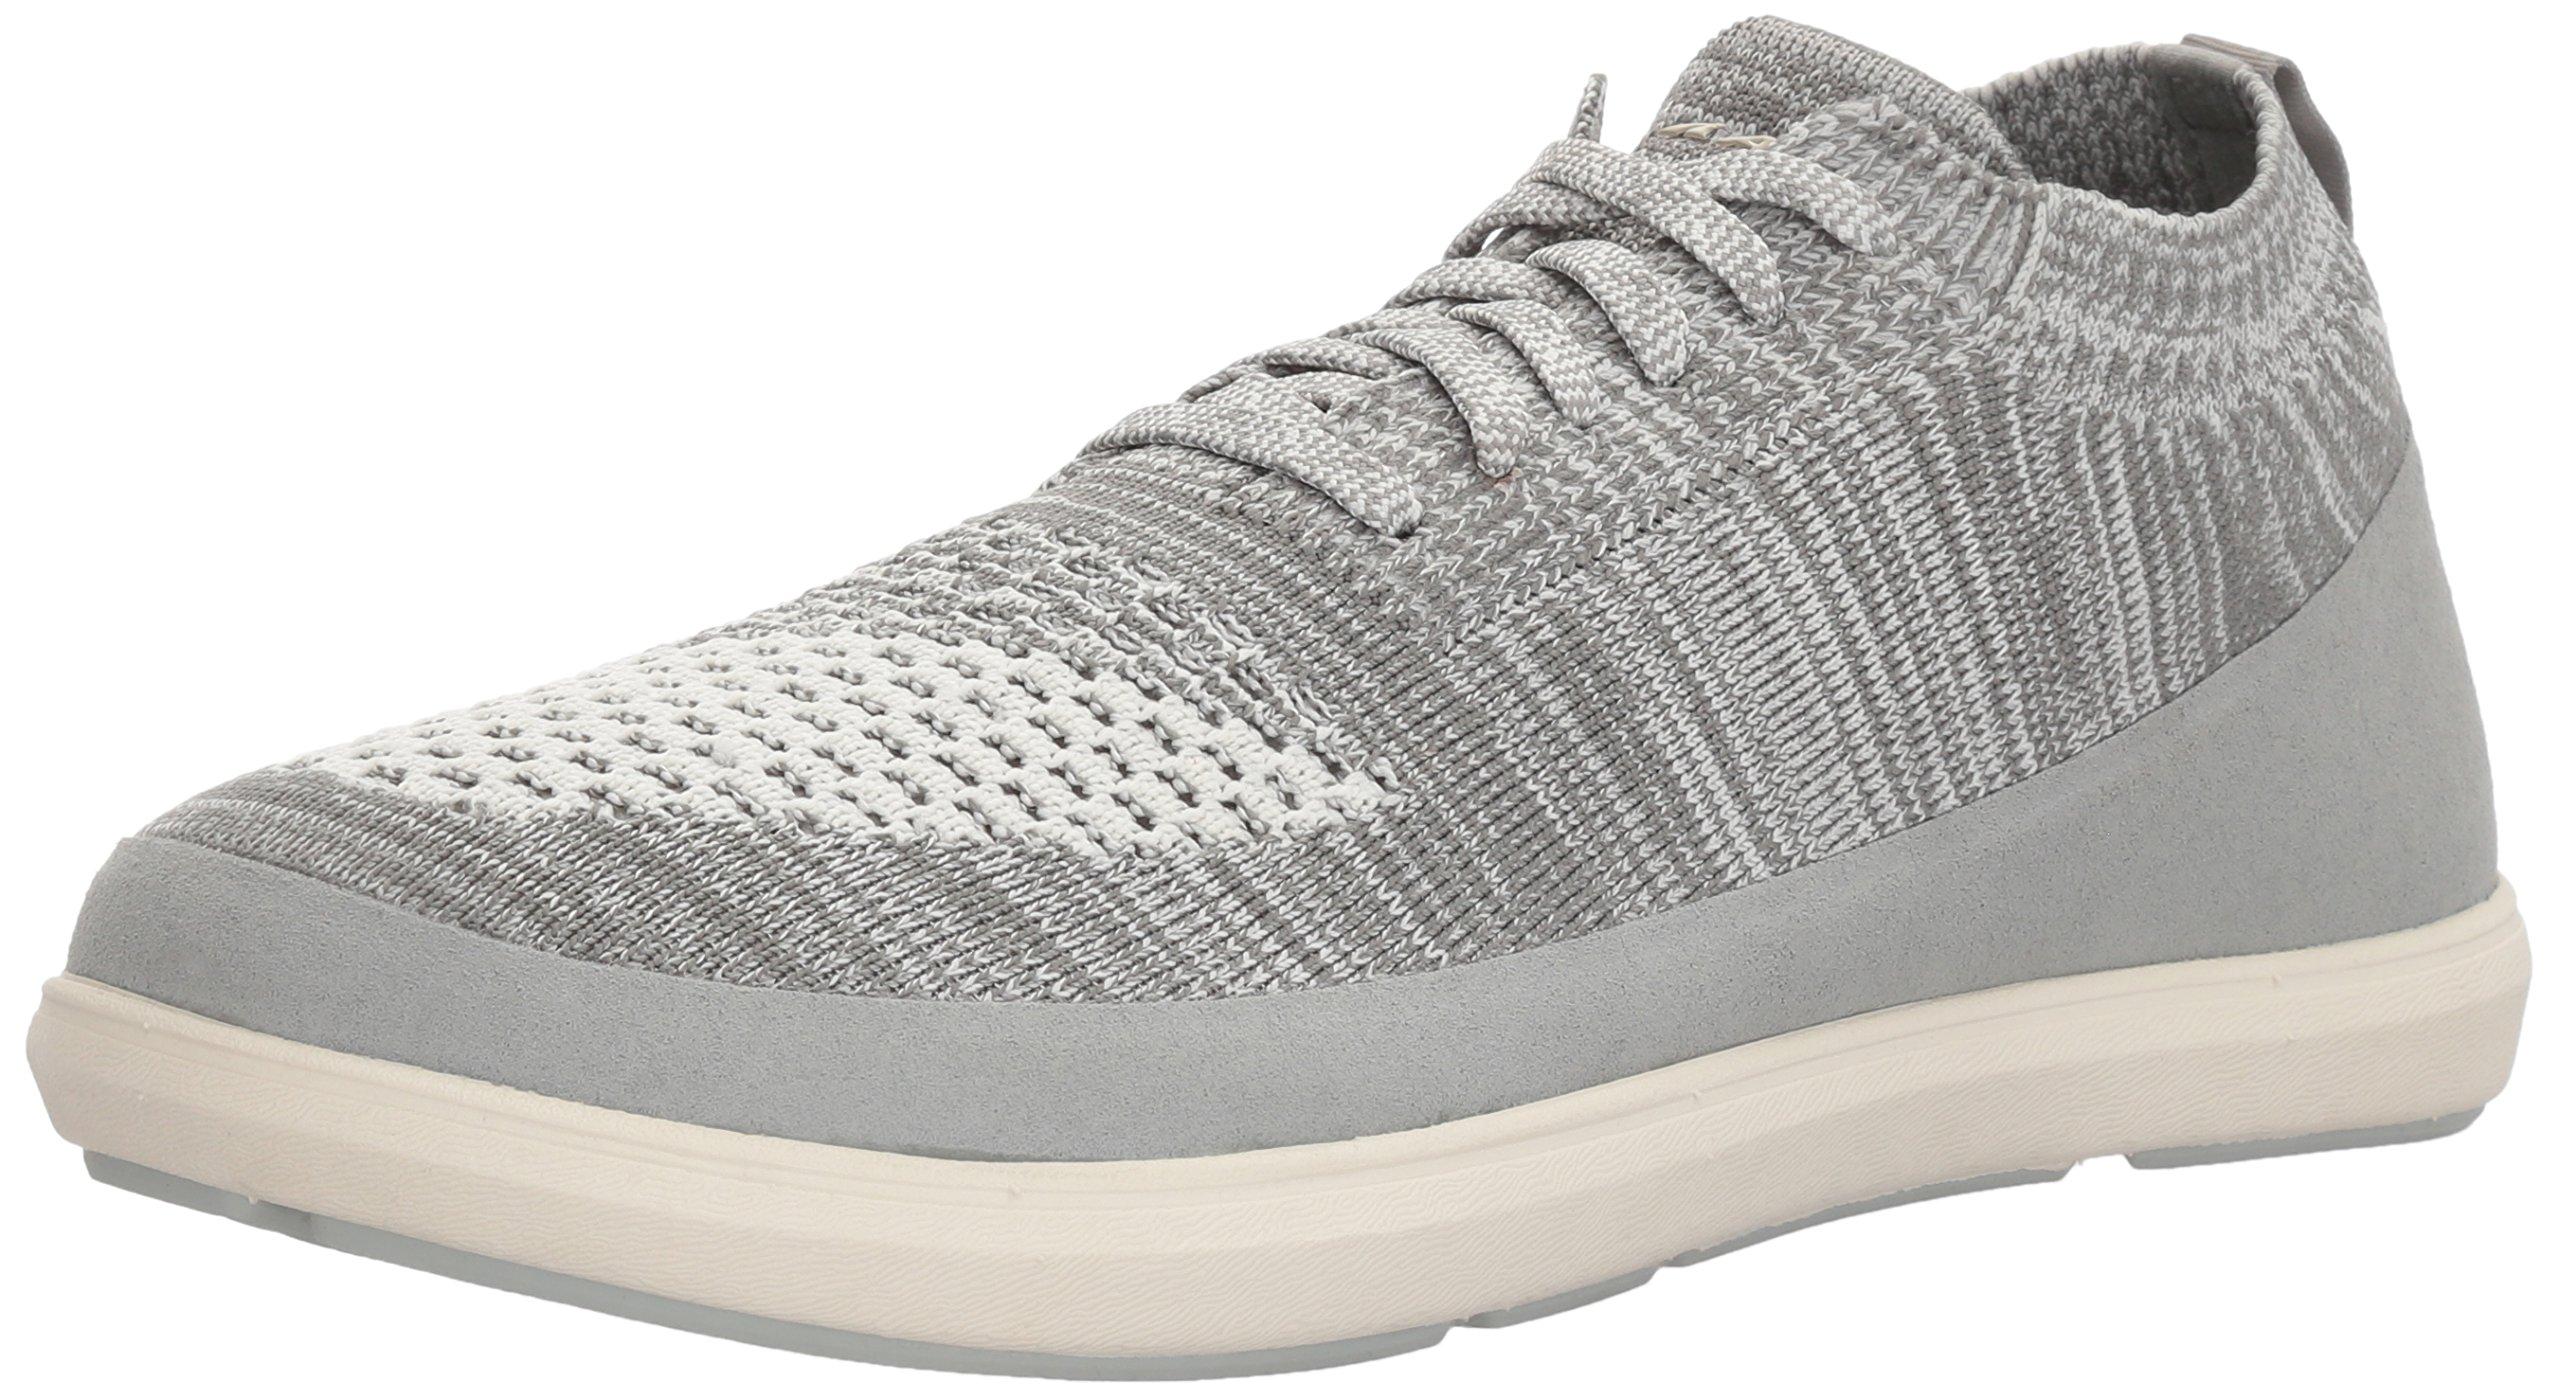 Altra Women's Vali Sneaker, Light Gray, 7.5 Regular US